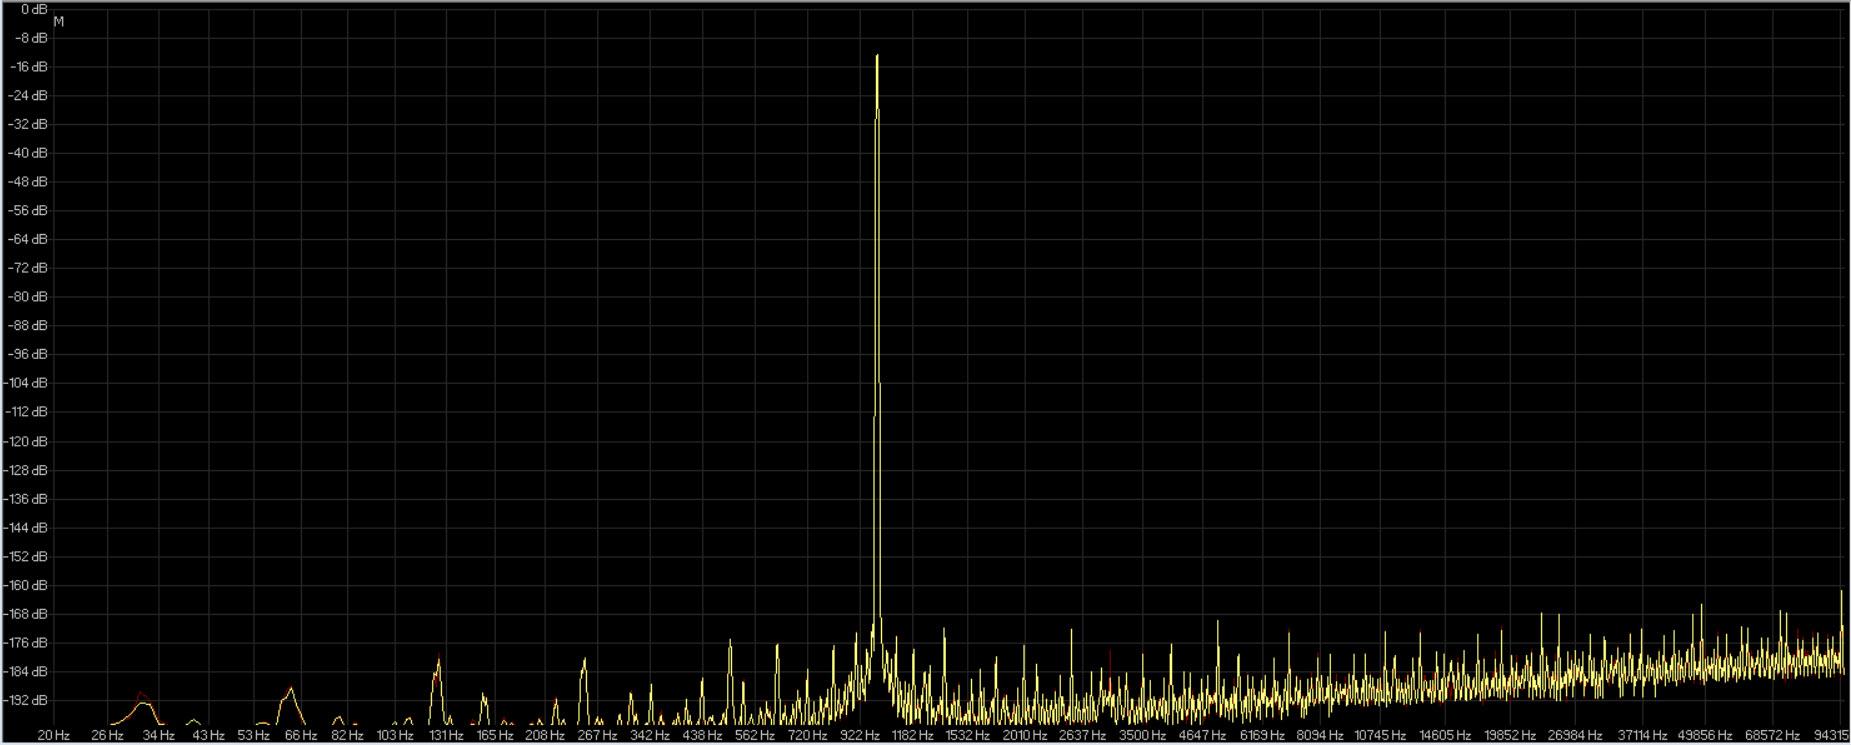 64fp-192 saracon ( giallo ) wavelab 6 ( rosso ).jpg